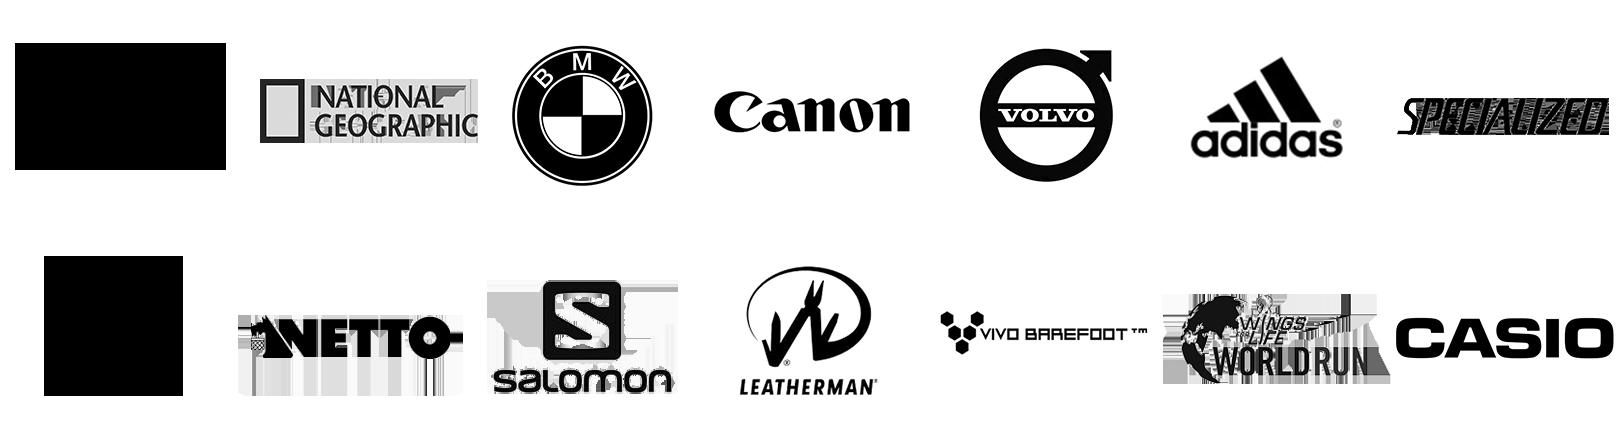 WEB logos layout03.png